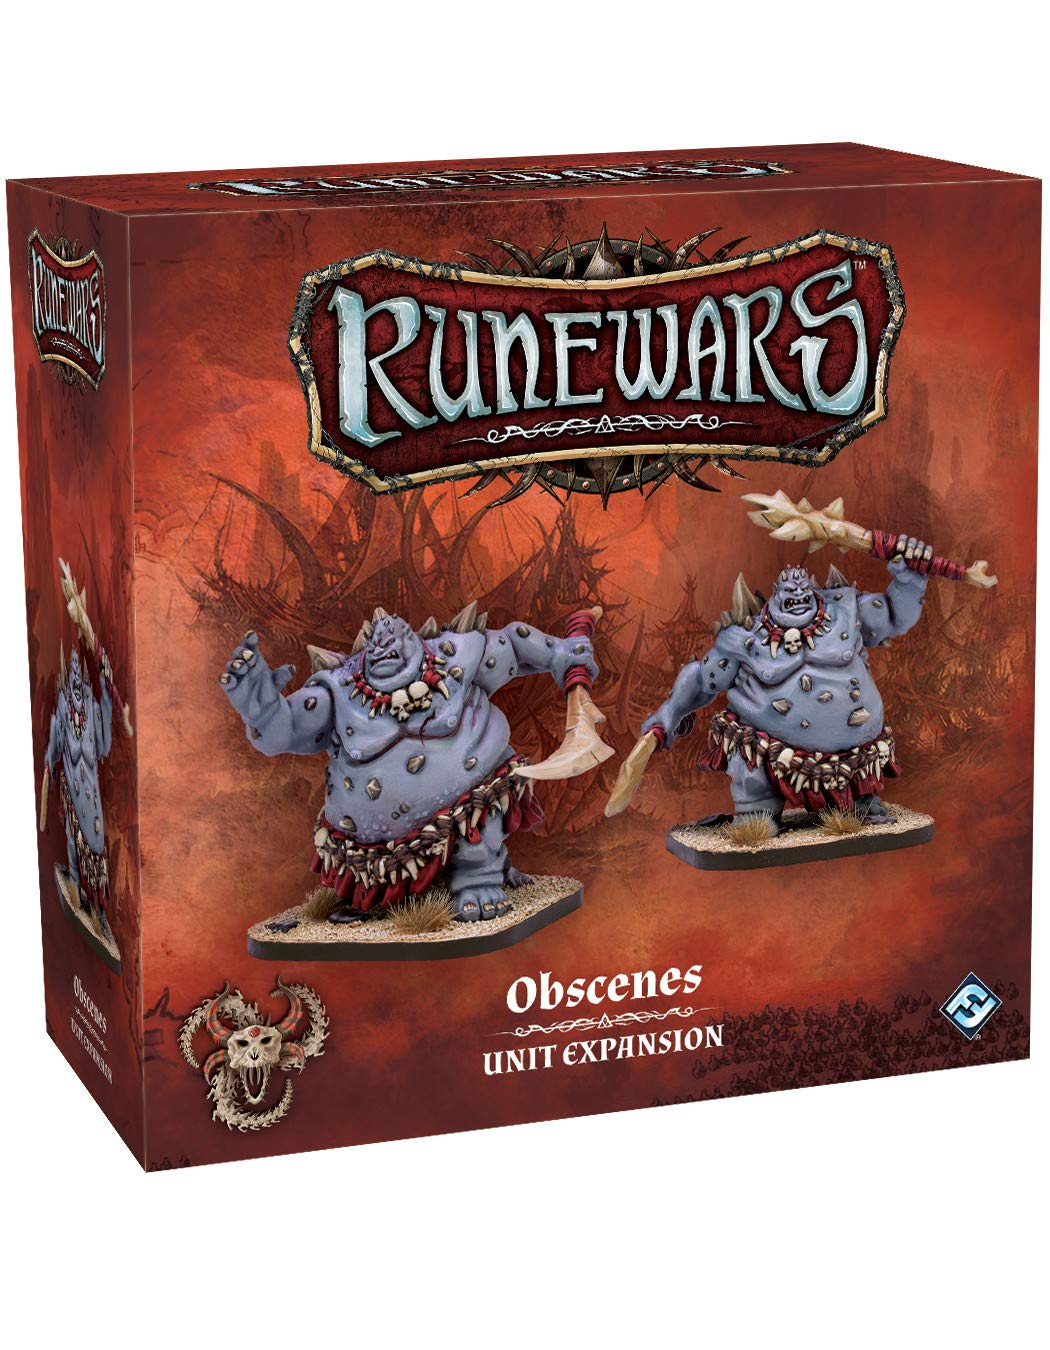 Fantasy Fantasy Fantasy Flight Games RuneWars: The Miniatures Game - Obscenes Unit Expansion - English 6ab748